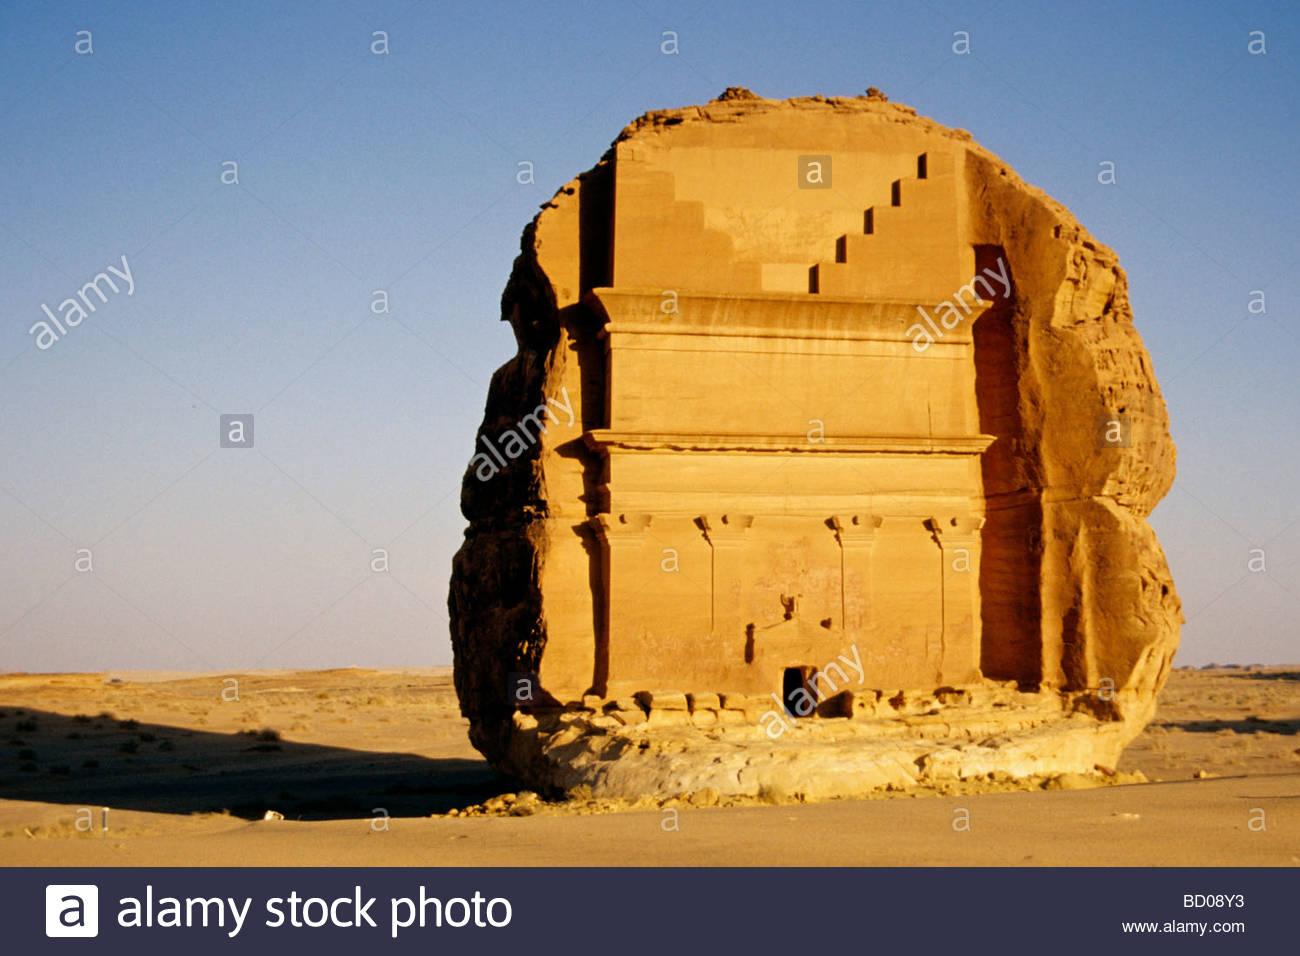 dedan, saudi arabian, asia - Stock Image